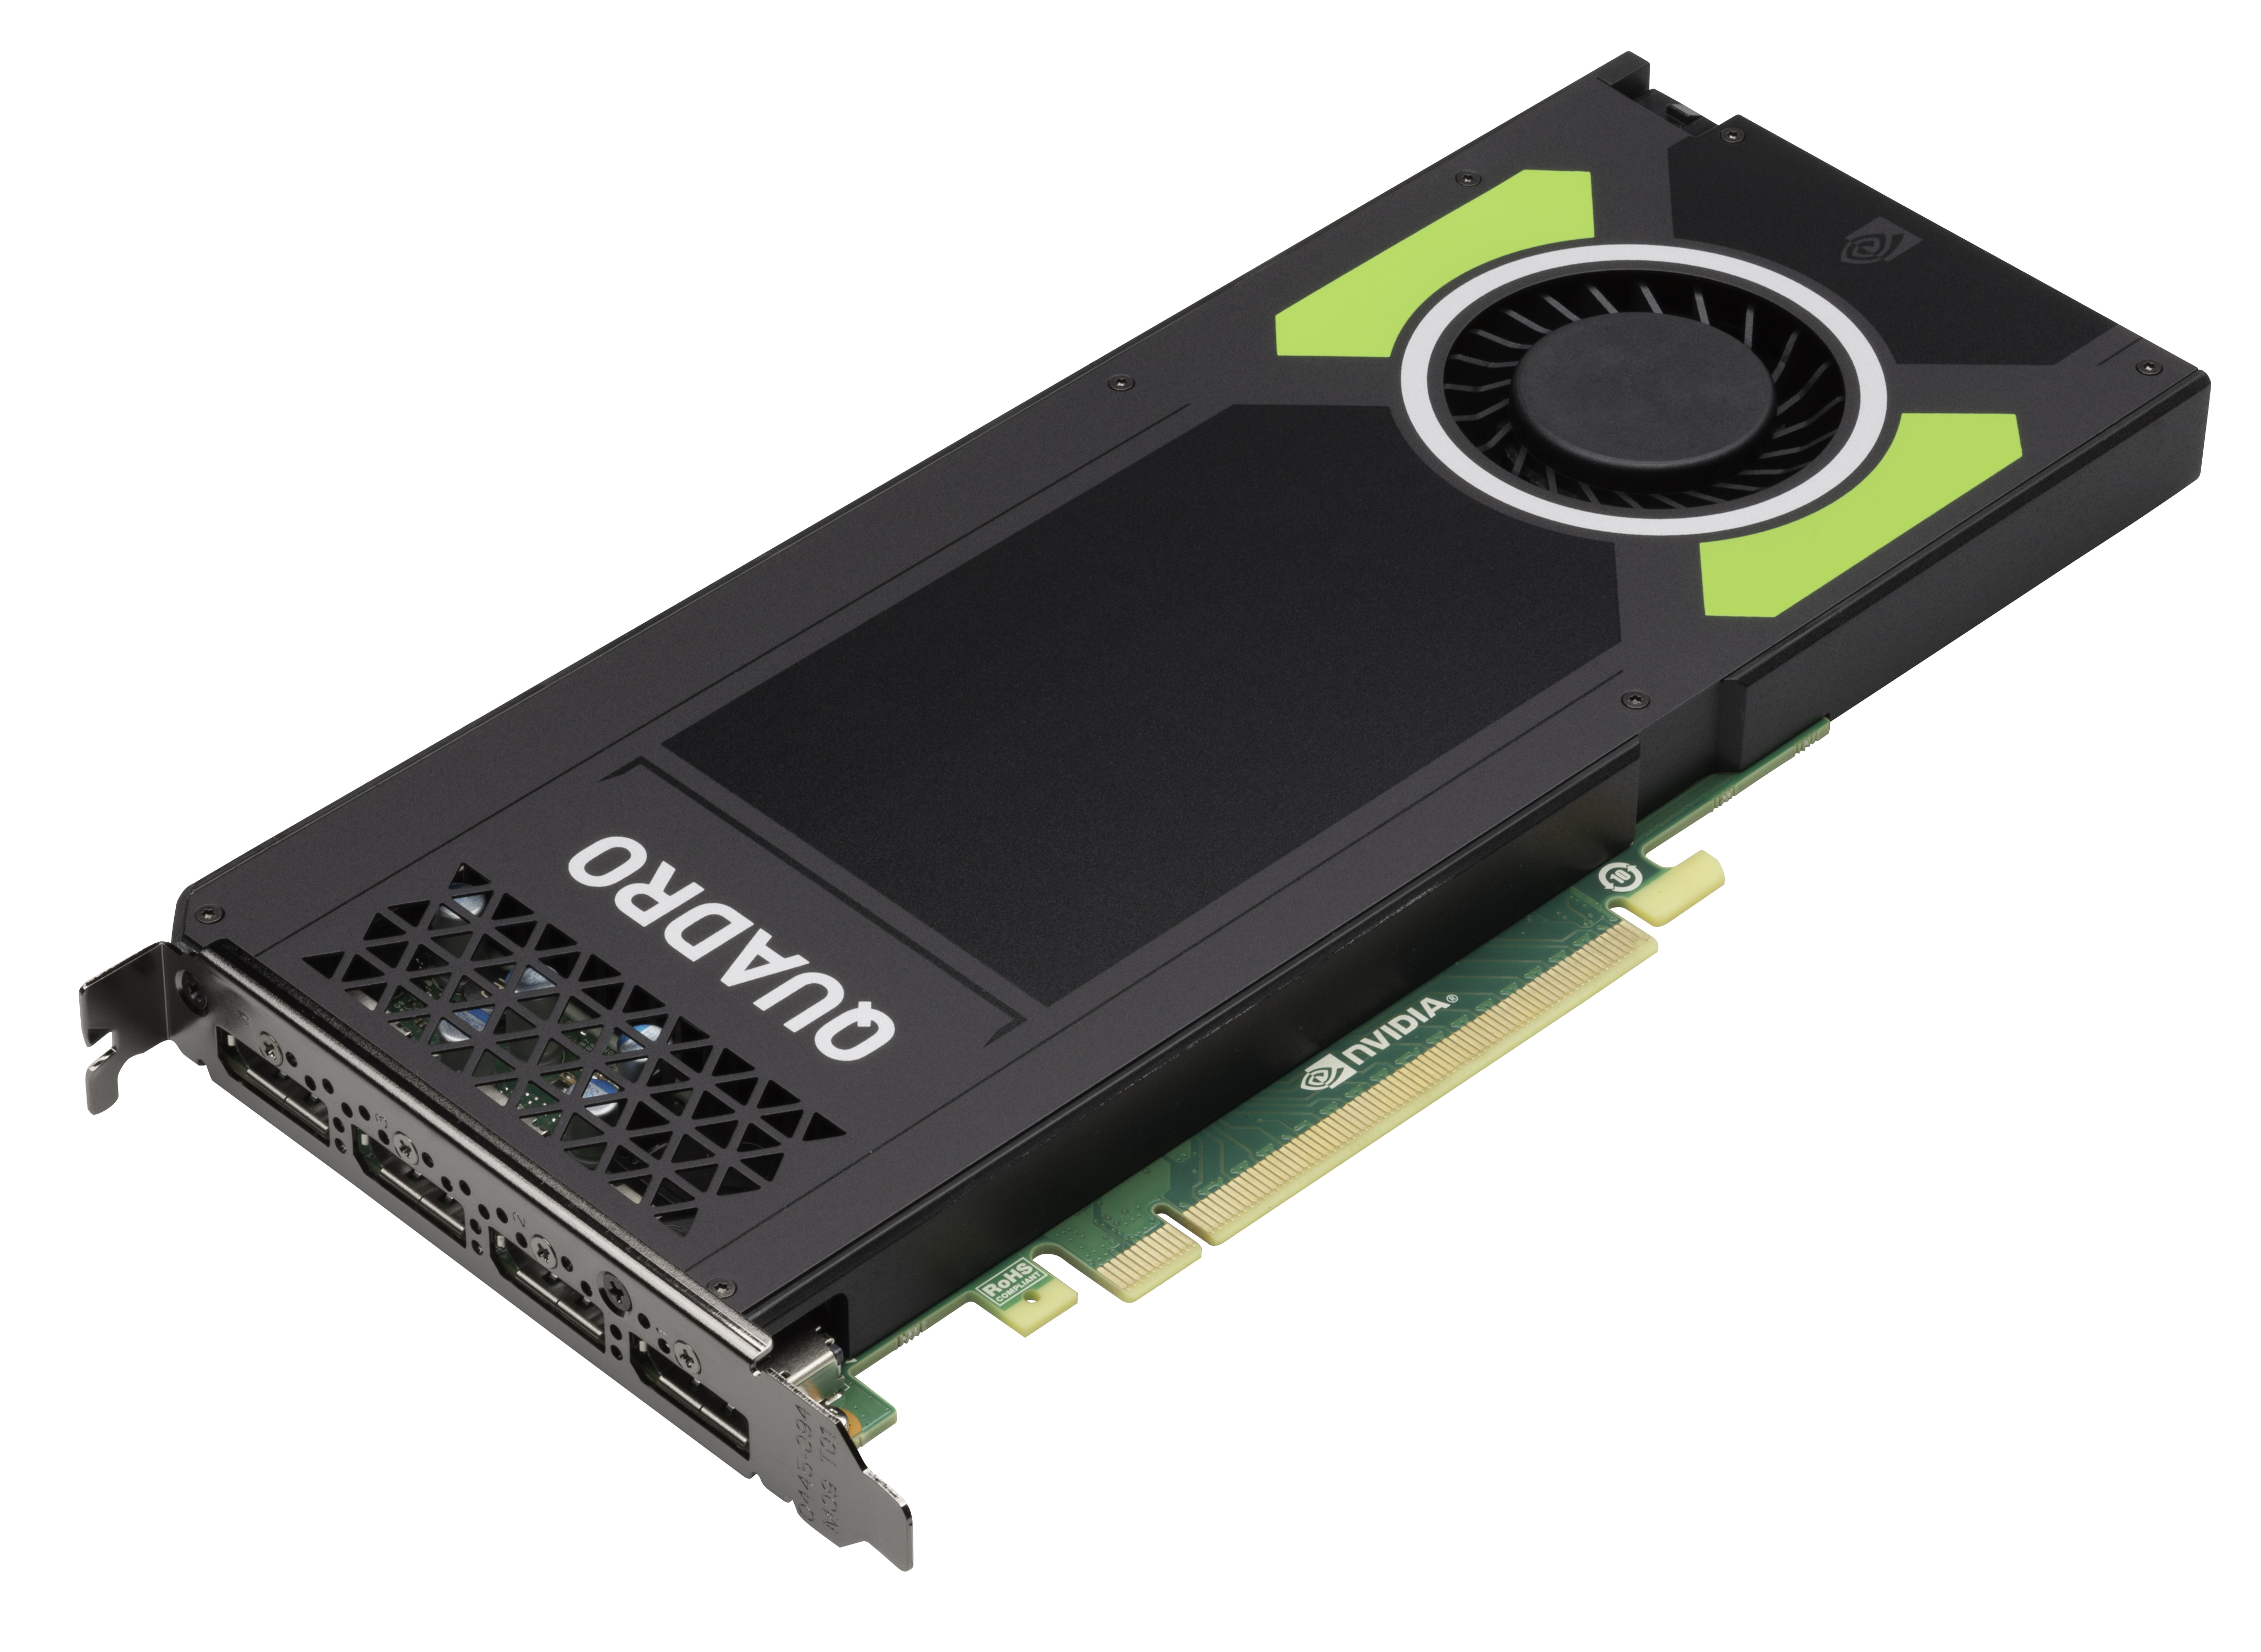 Quadro M5000 與 M4000 亮相,NVIDIA 專業繪圖卡再添新成員